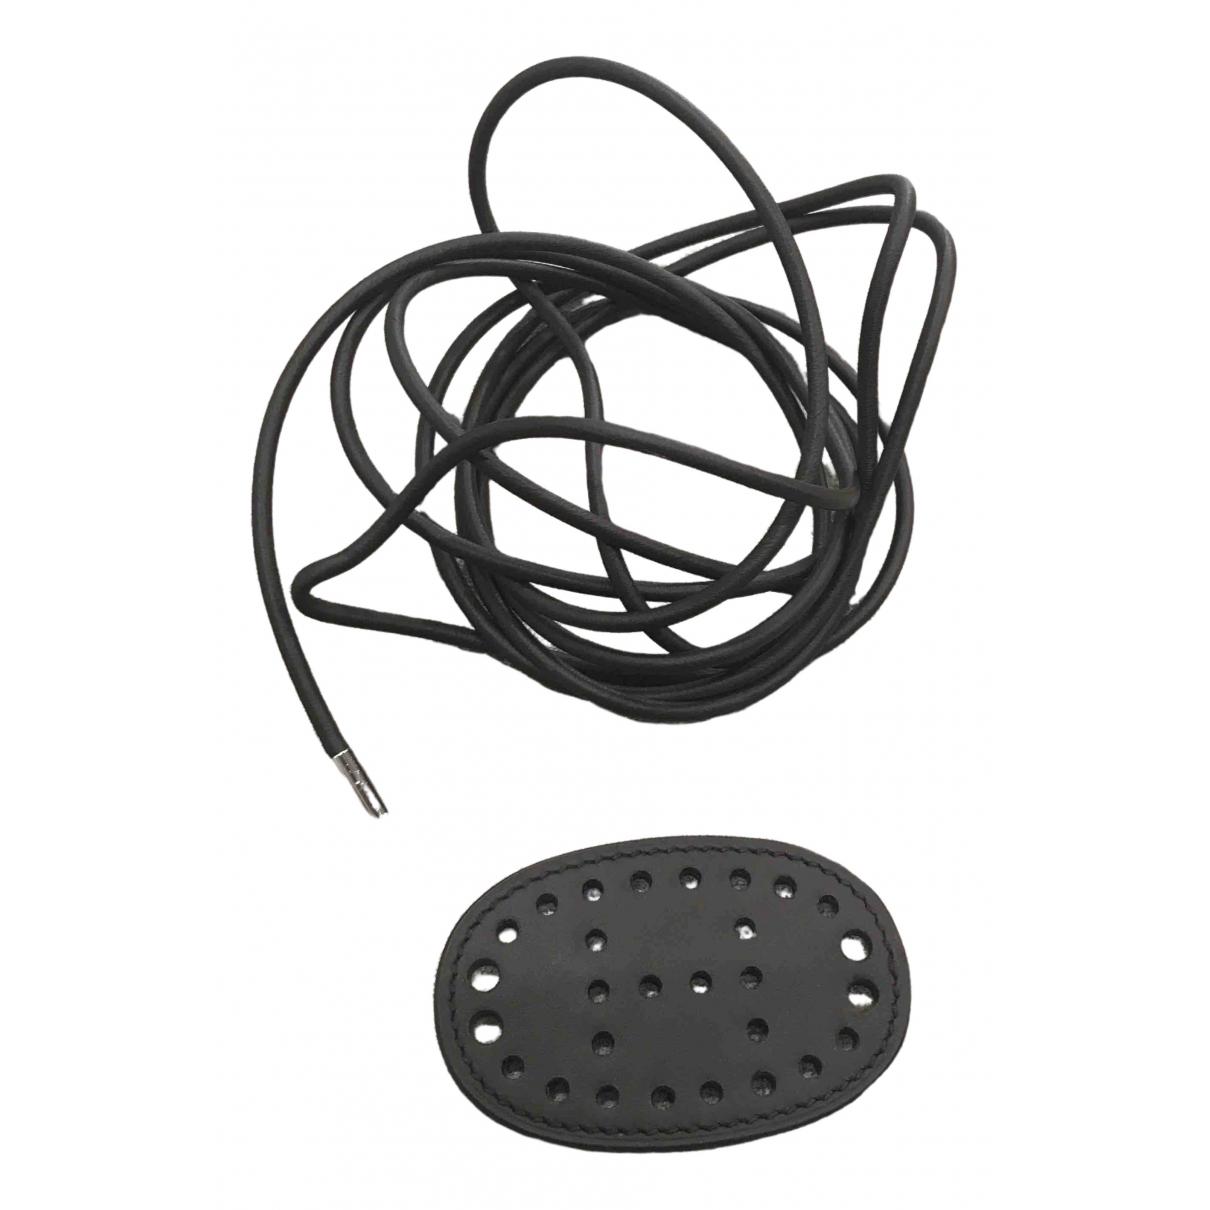 Cinturon Boucle seule / Belt buckle de Cuero Hermes